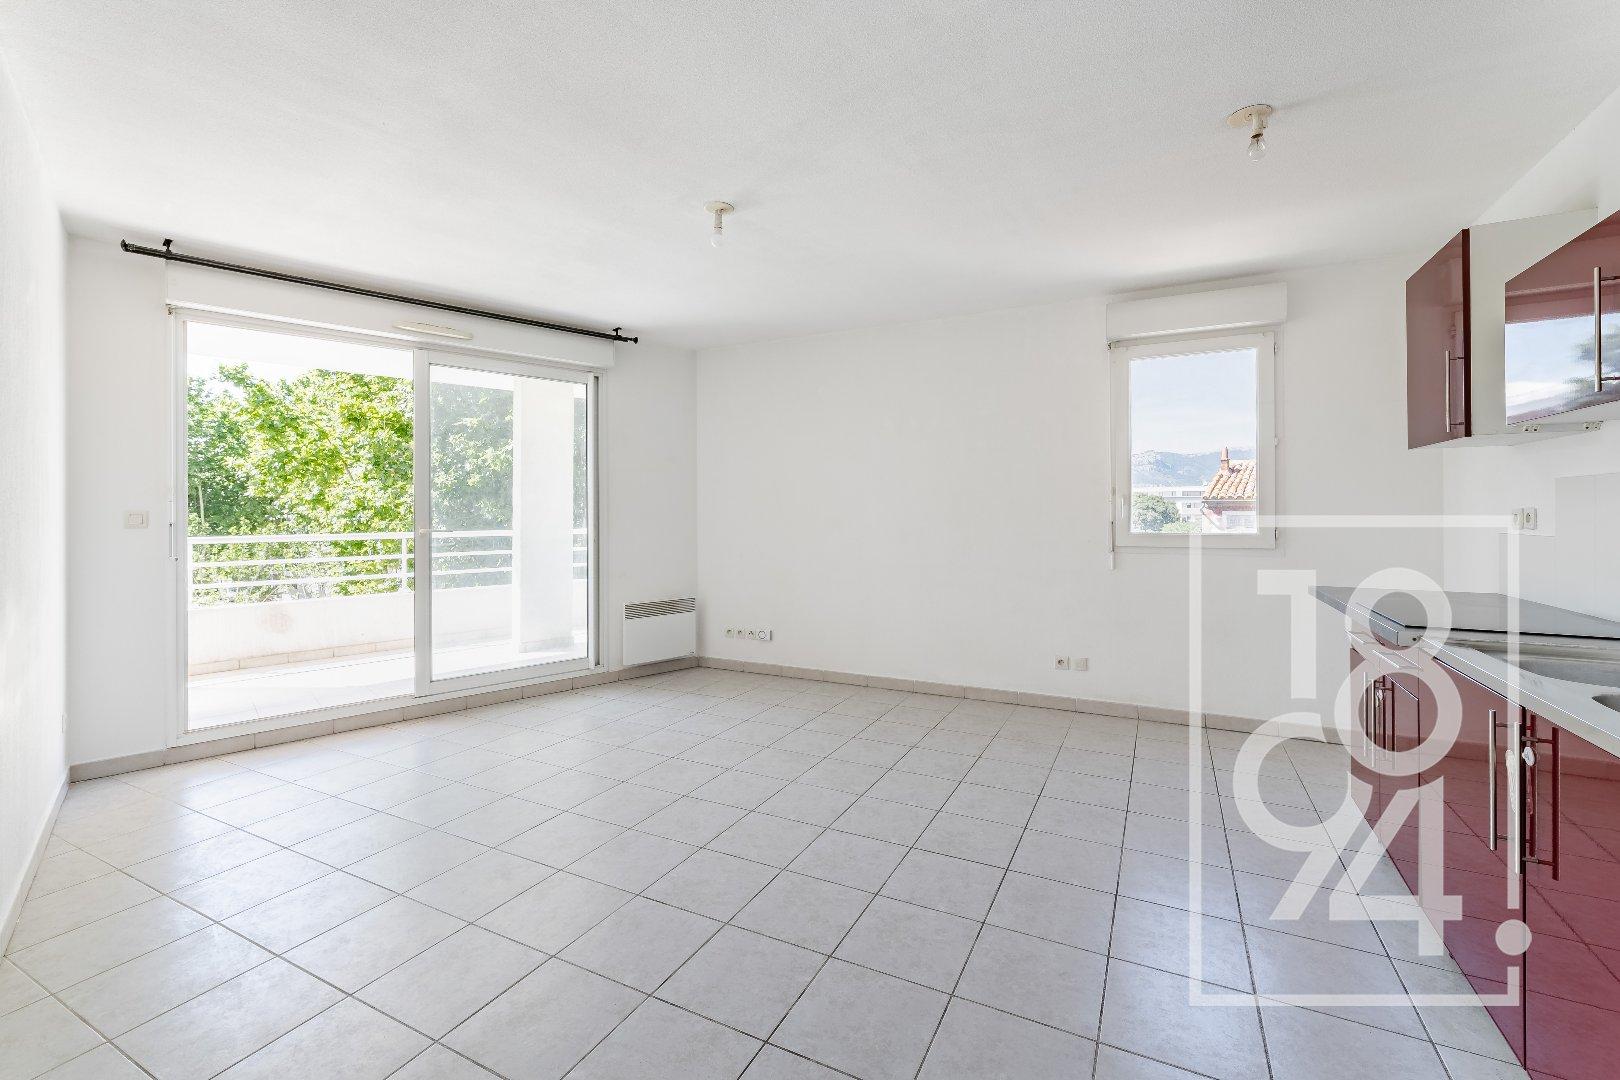 Appartement T3 lumineux + terrasse